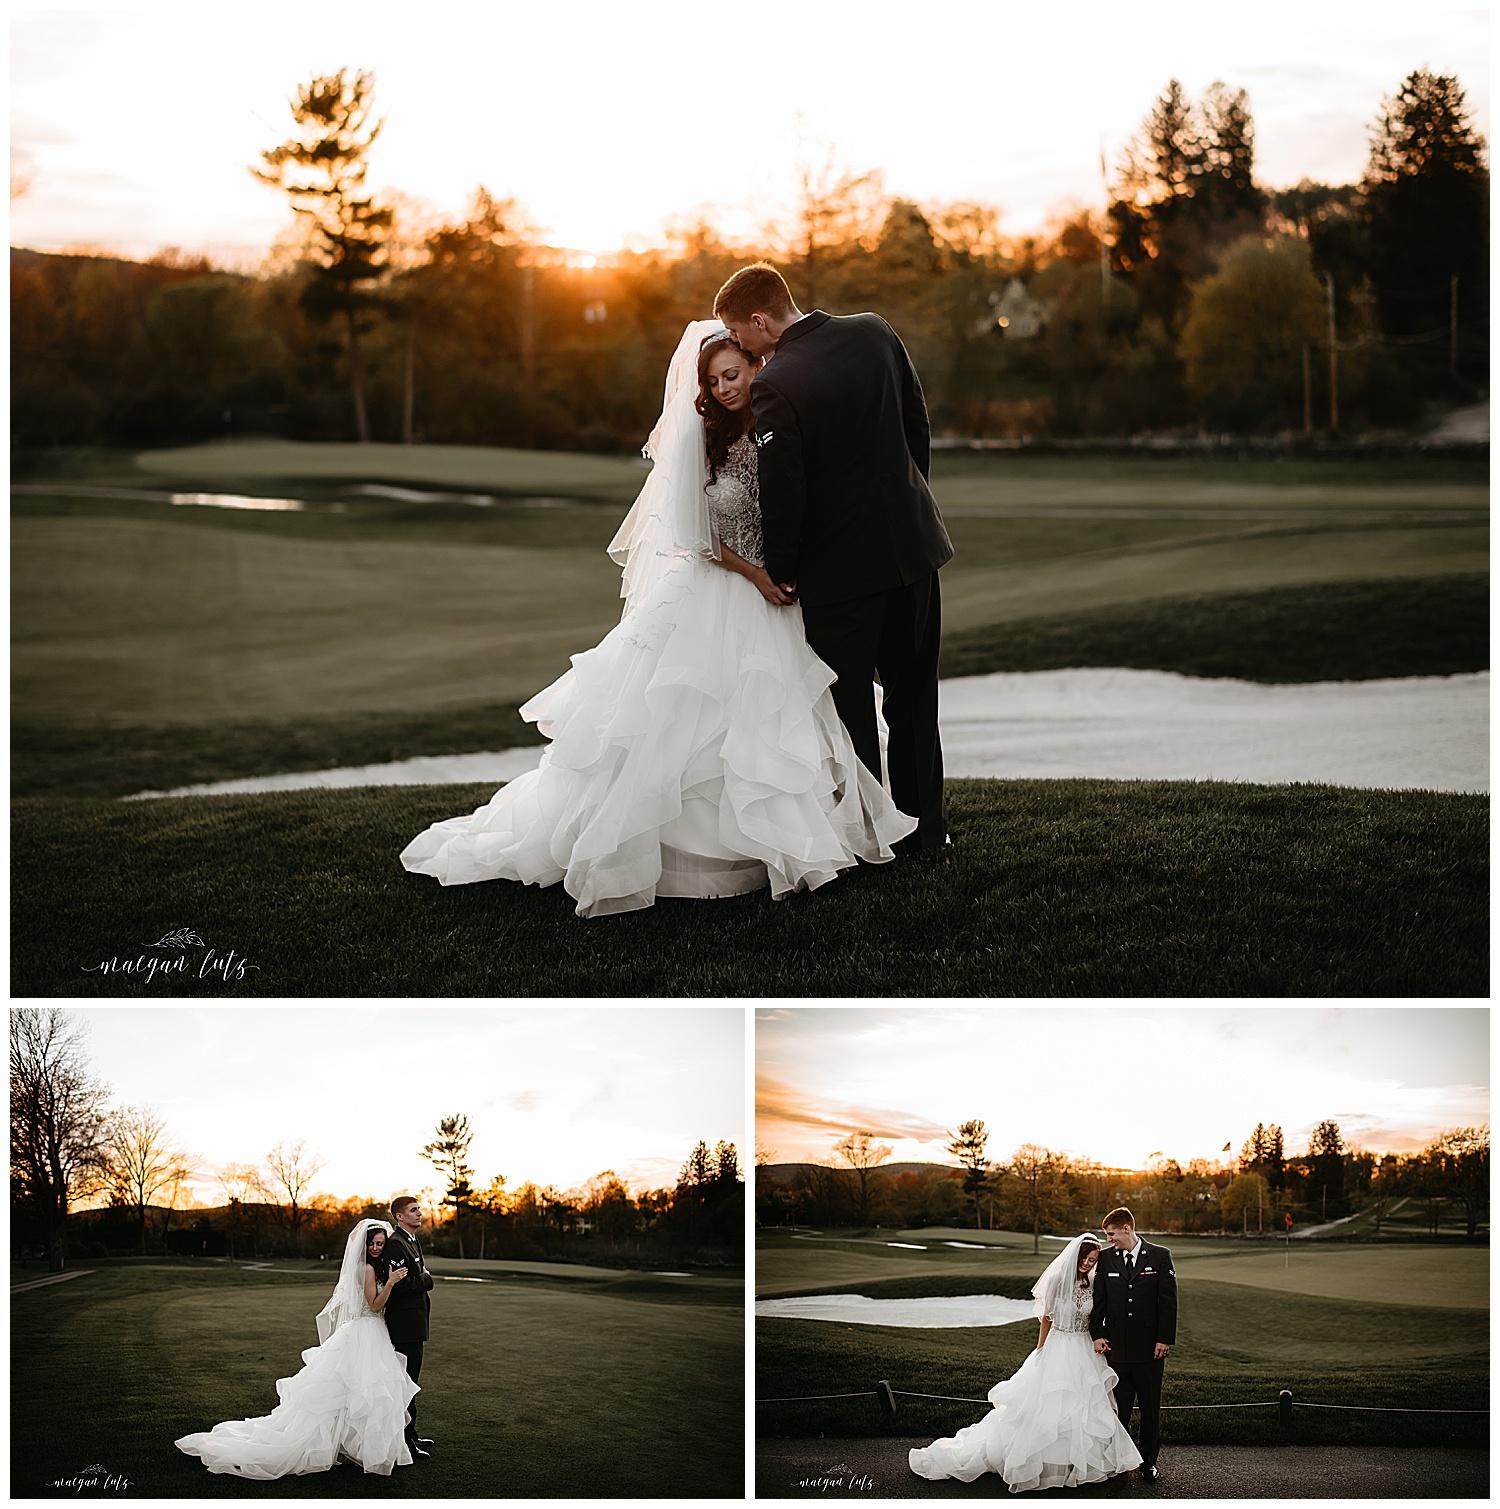 NEPA-Lehigh-Valley-Wedding-Photographer-at-Glen-Oak-Country-Club-Clarks-Summit-PA_0072.jpg